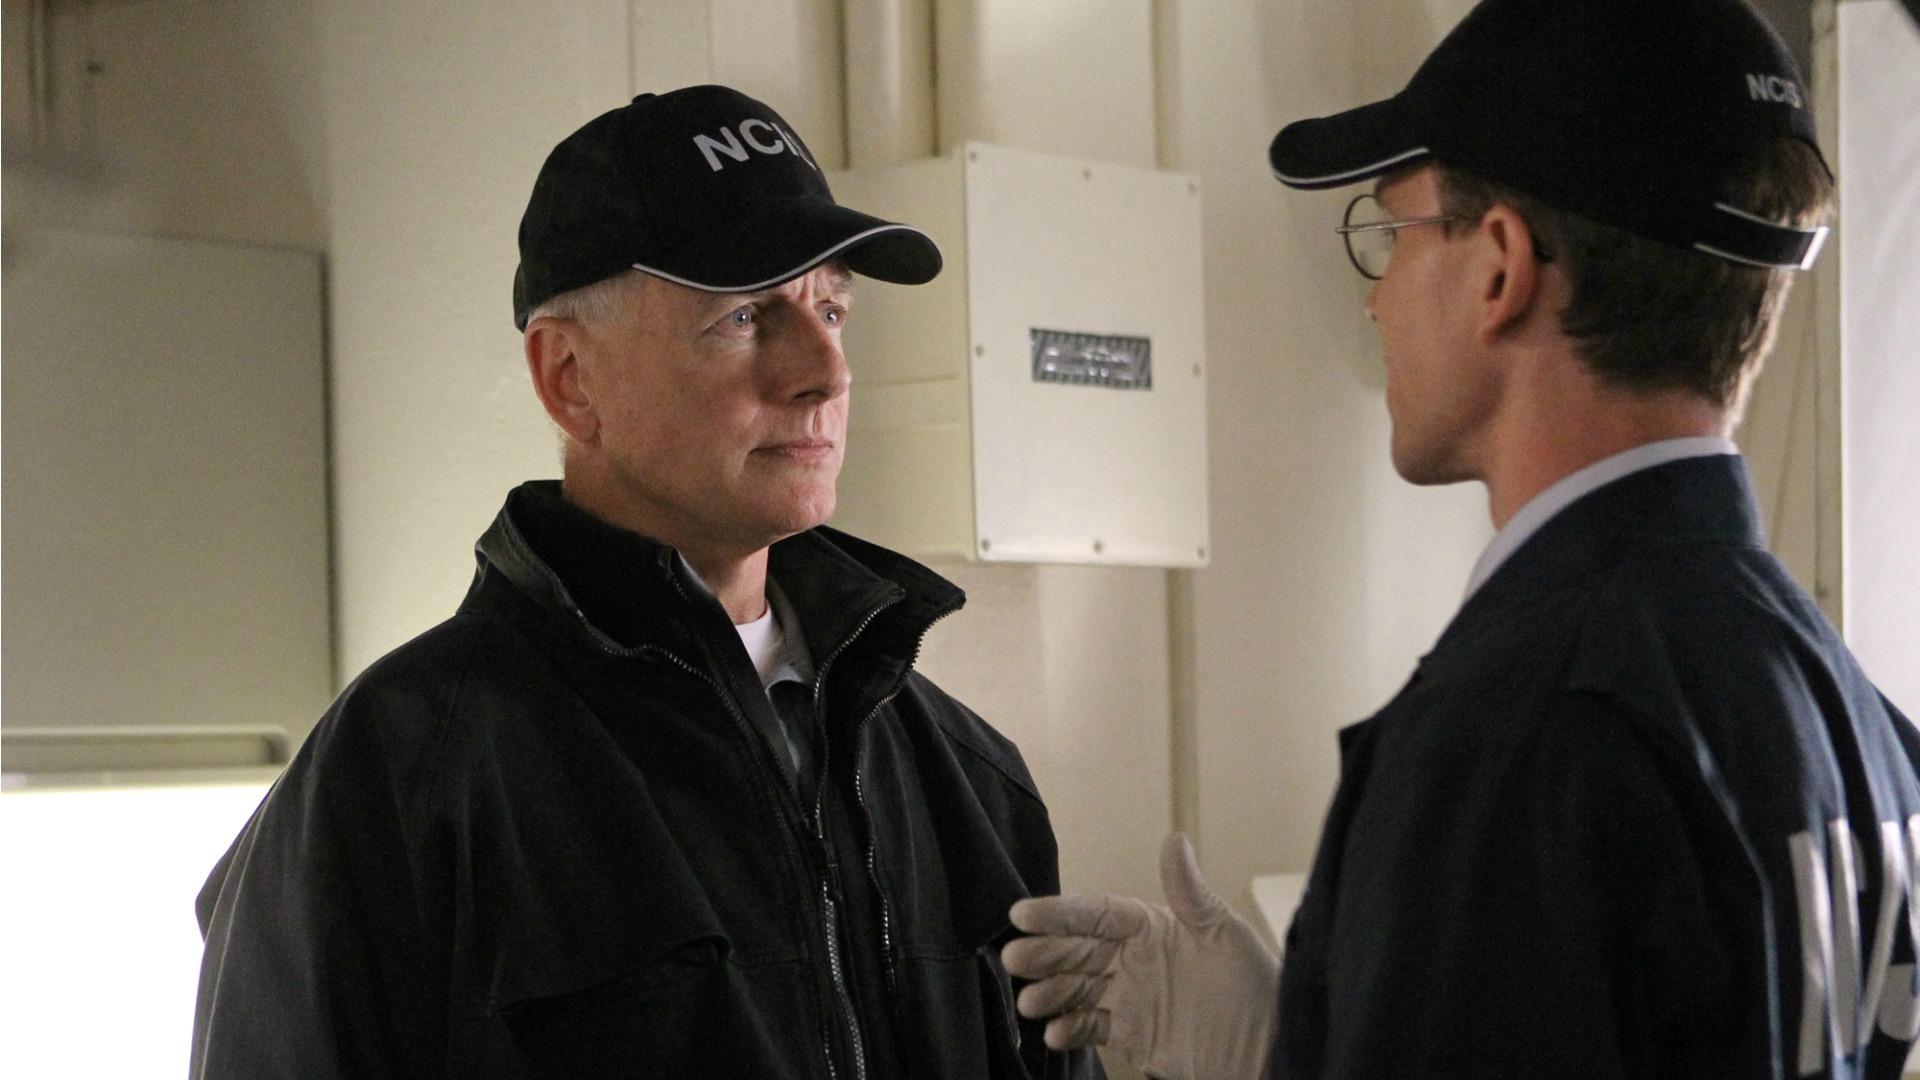 Gibbs' Rule #2: Always wear gloves at a crime scene.